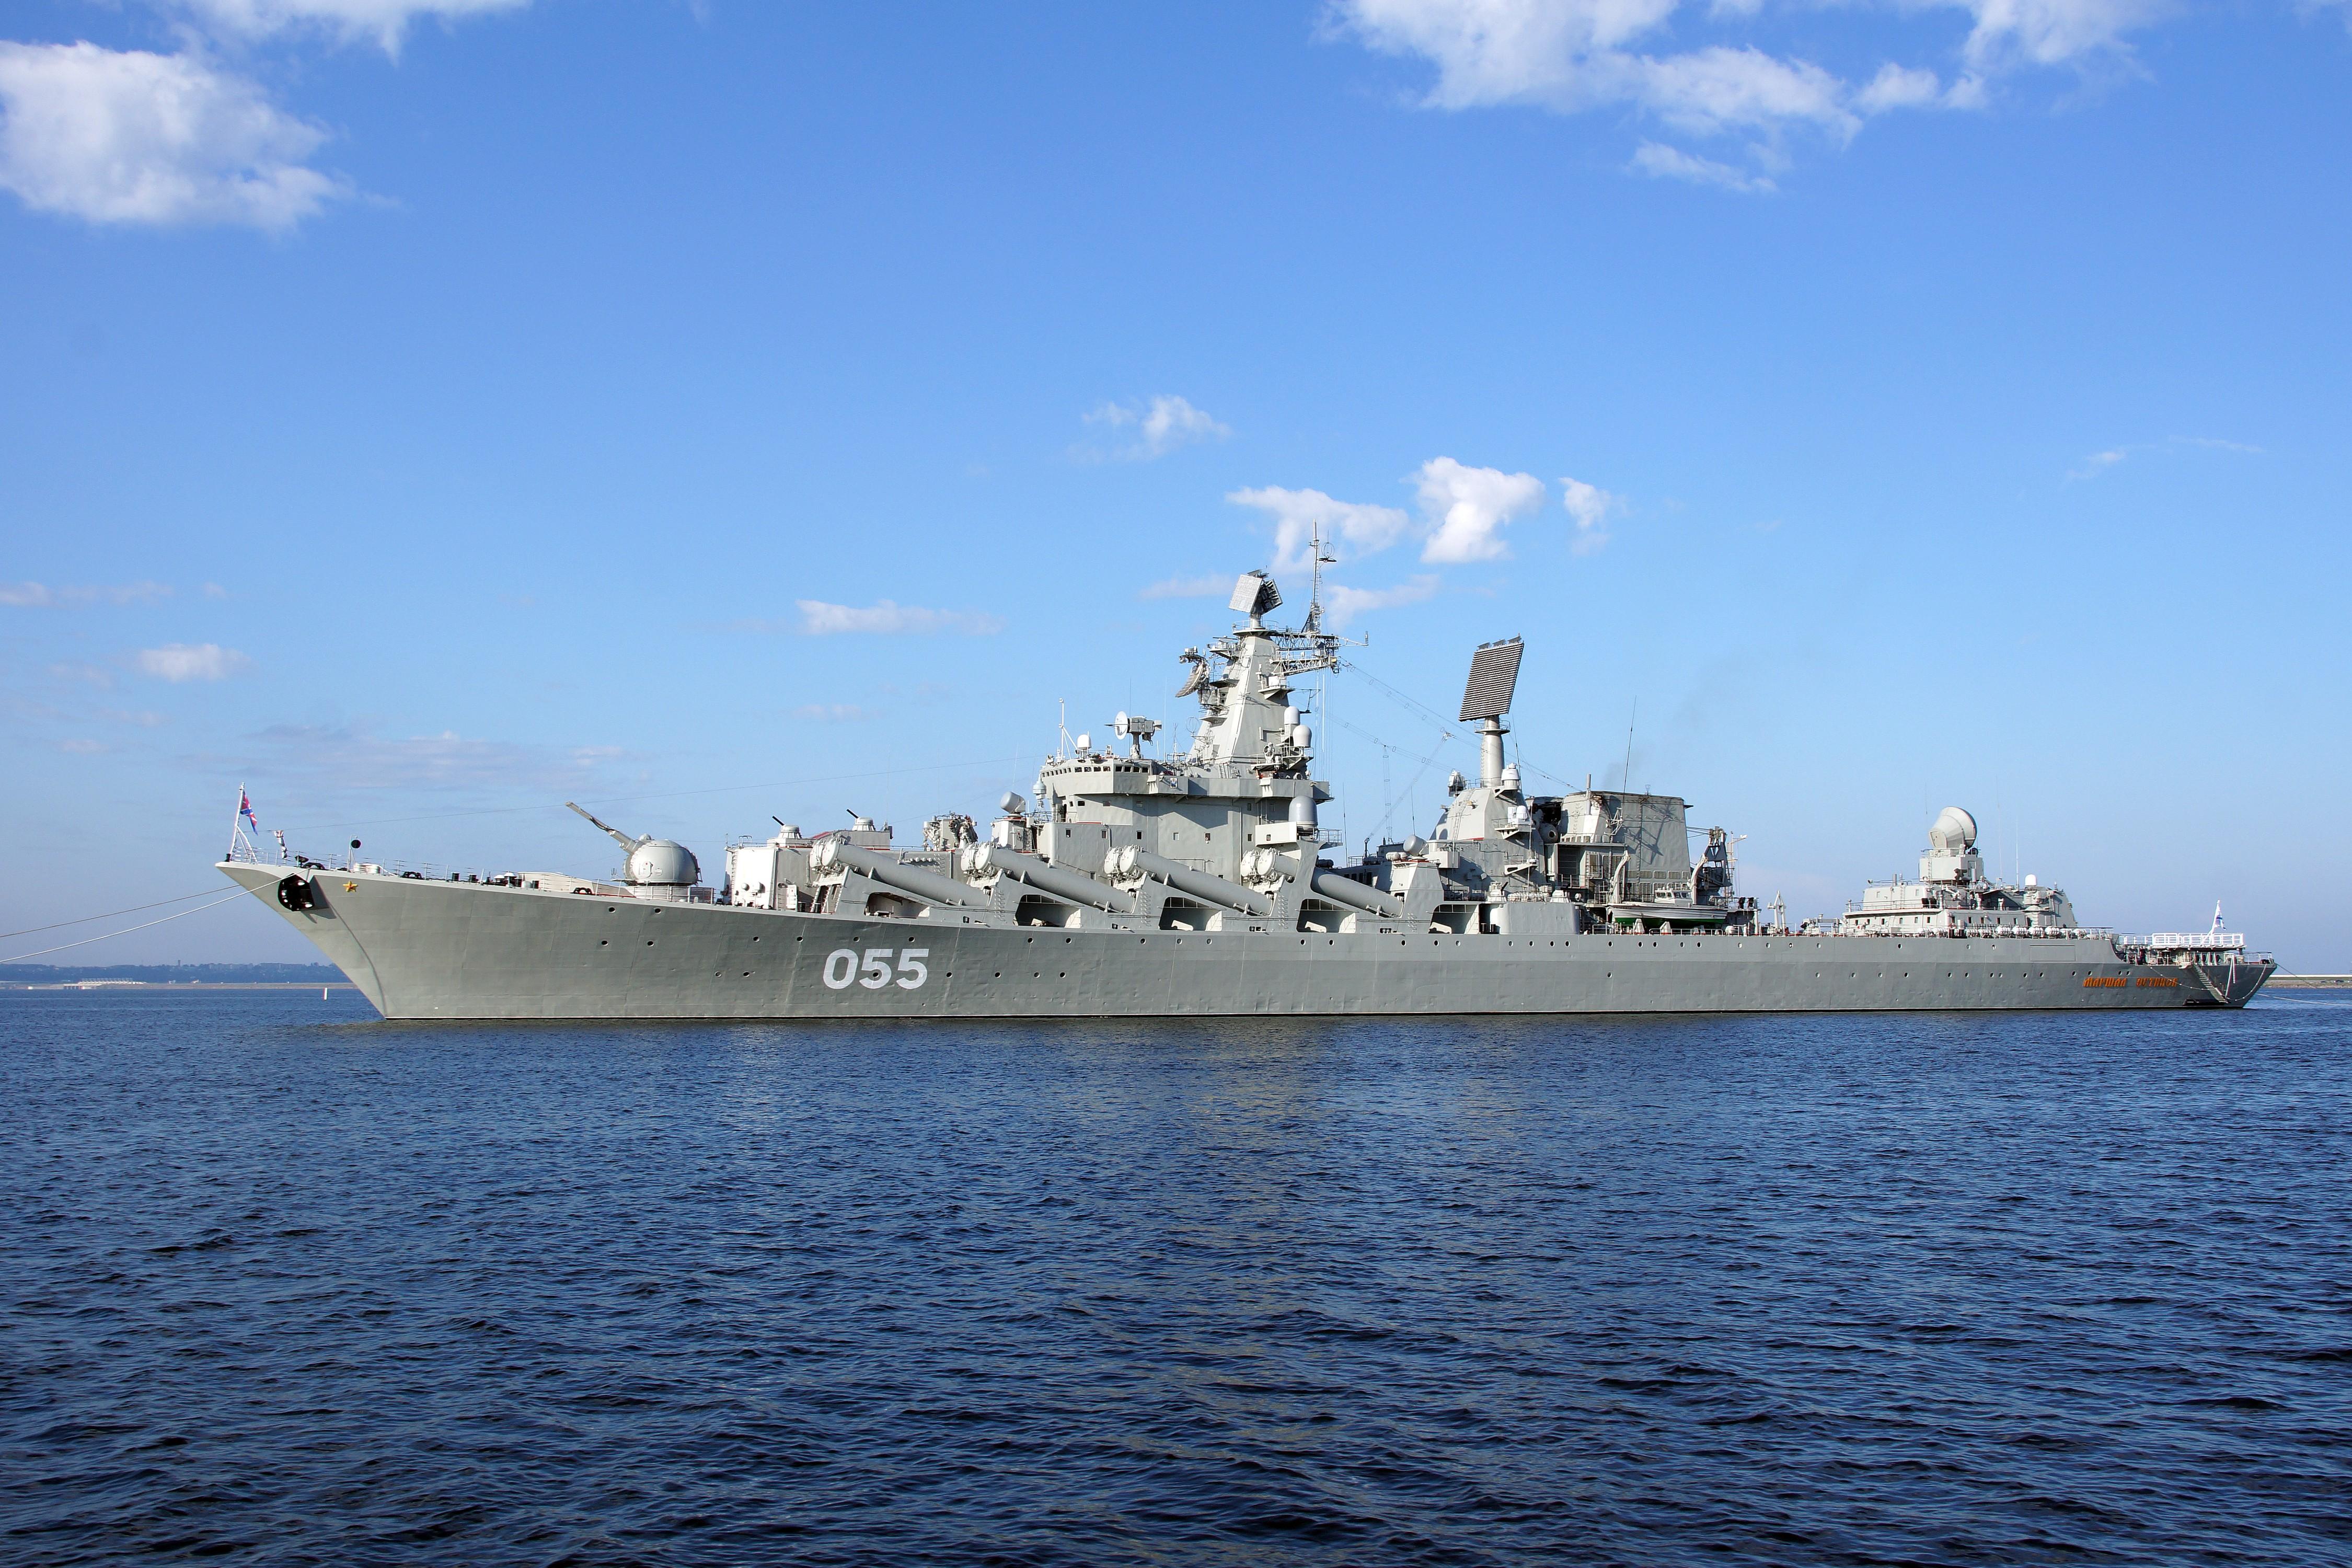 Project 1164 Atlant: Slava Class cruiser - Page 10 24-6505749-2018-07-24-08-10-16-dsc05980